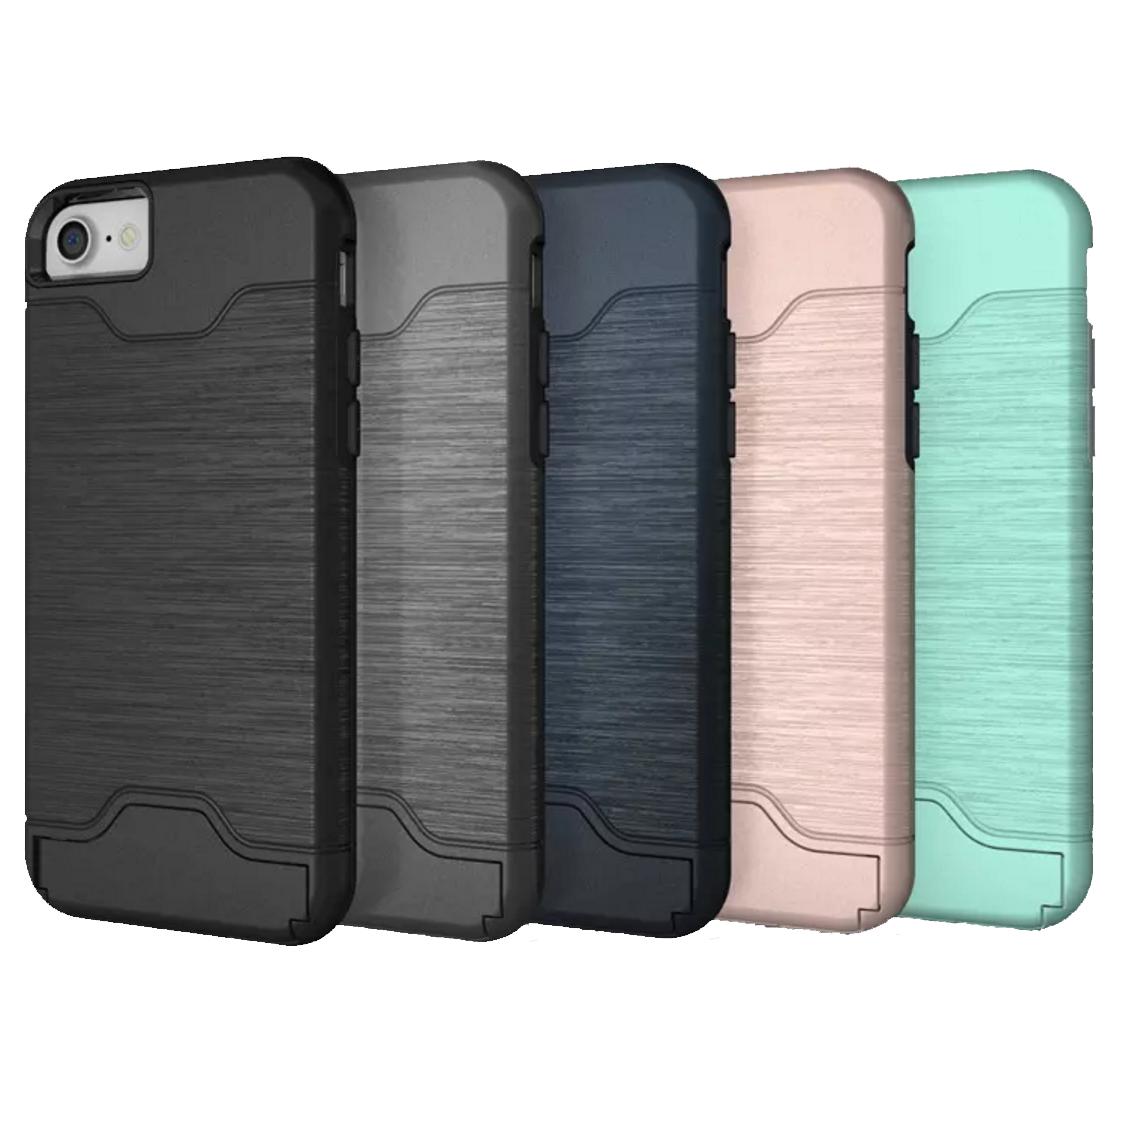 outlet store 15574 62eb8 iPhone 6S Plus Card Slot Case - Blue